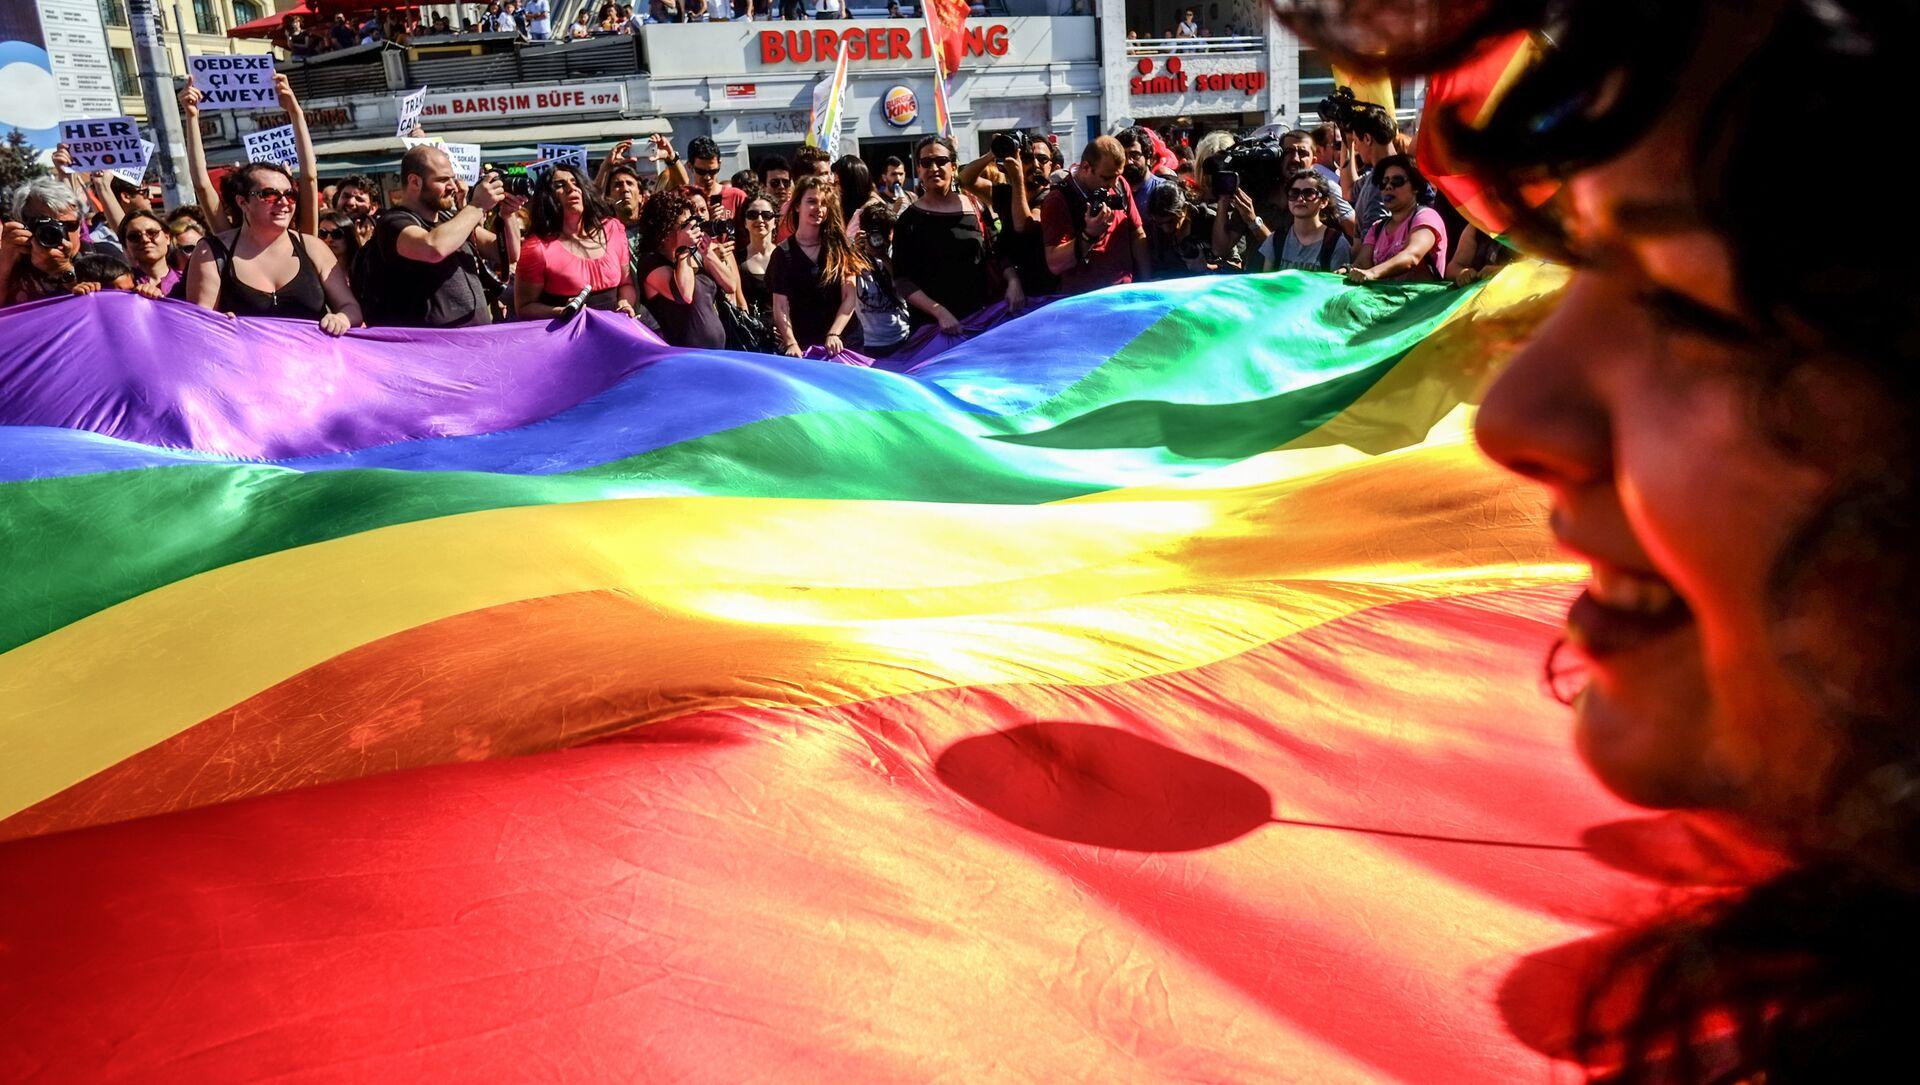 Гей-парад в Стамбуле - Sputnik Արմենիա, 1920, 07.07.2021